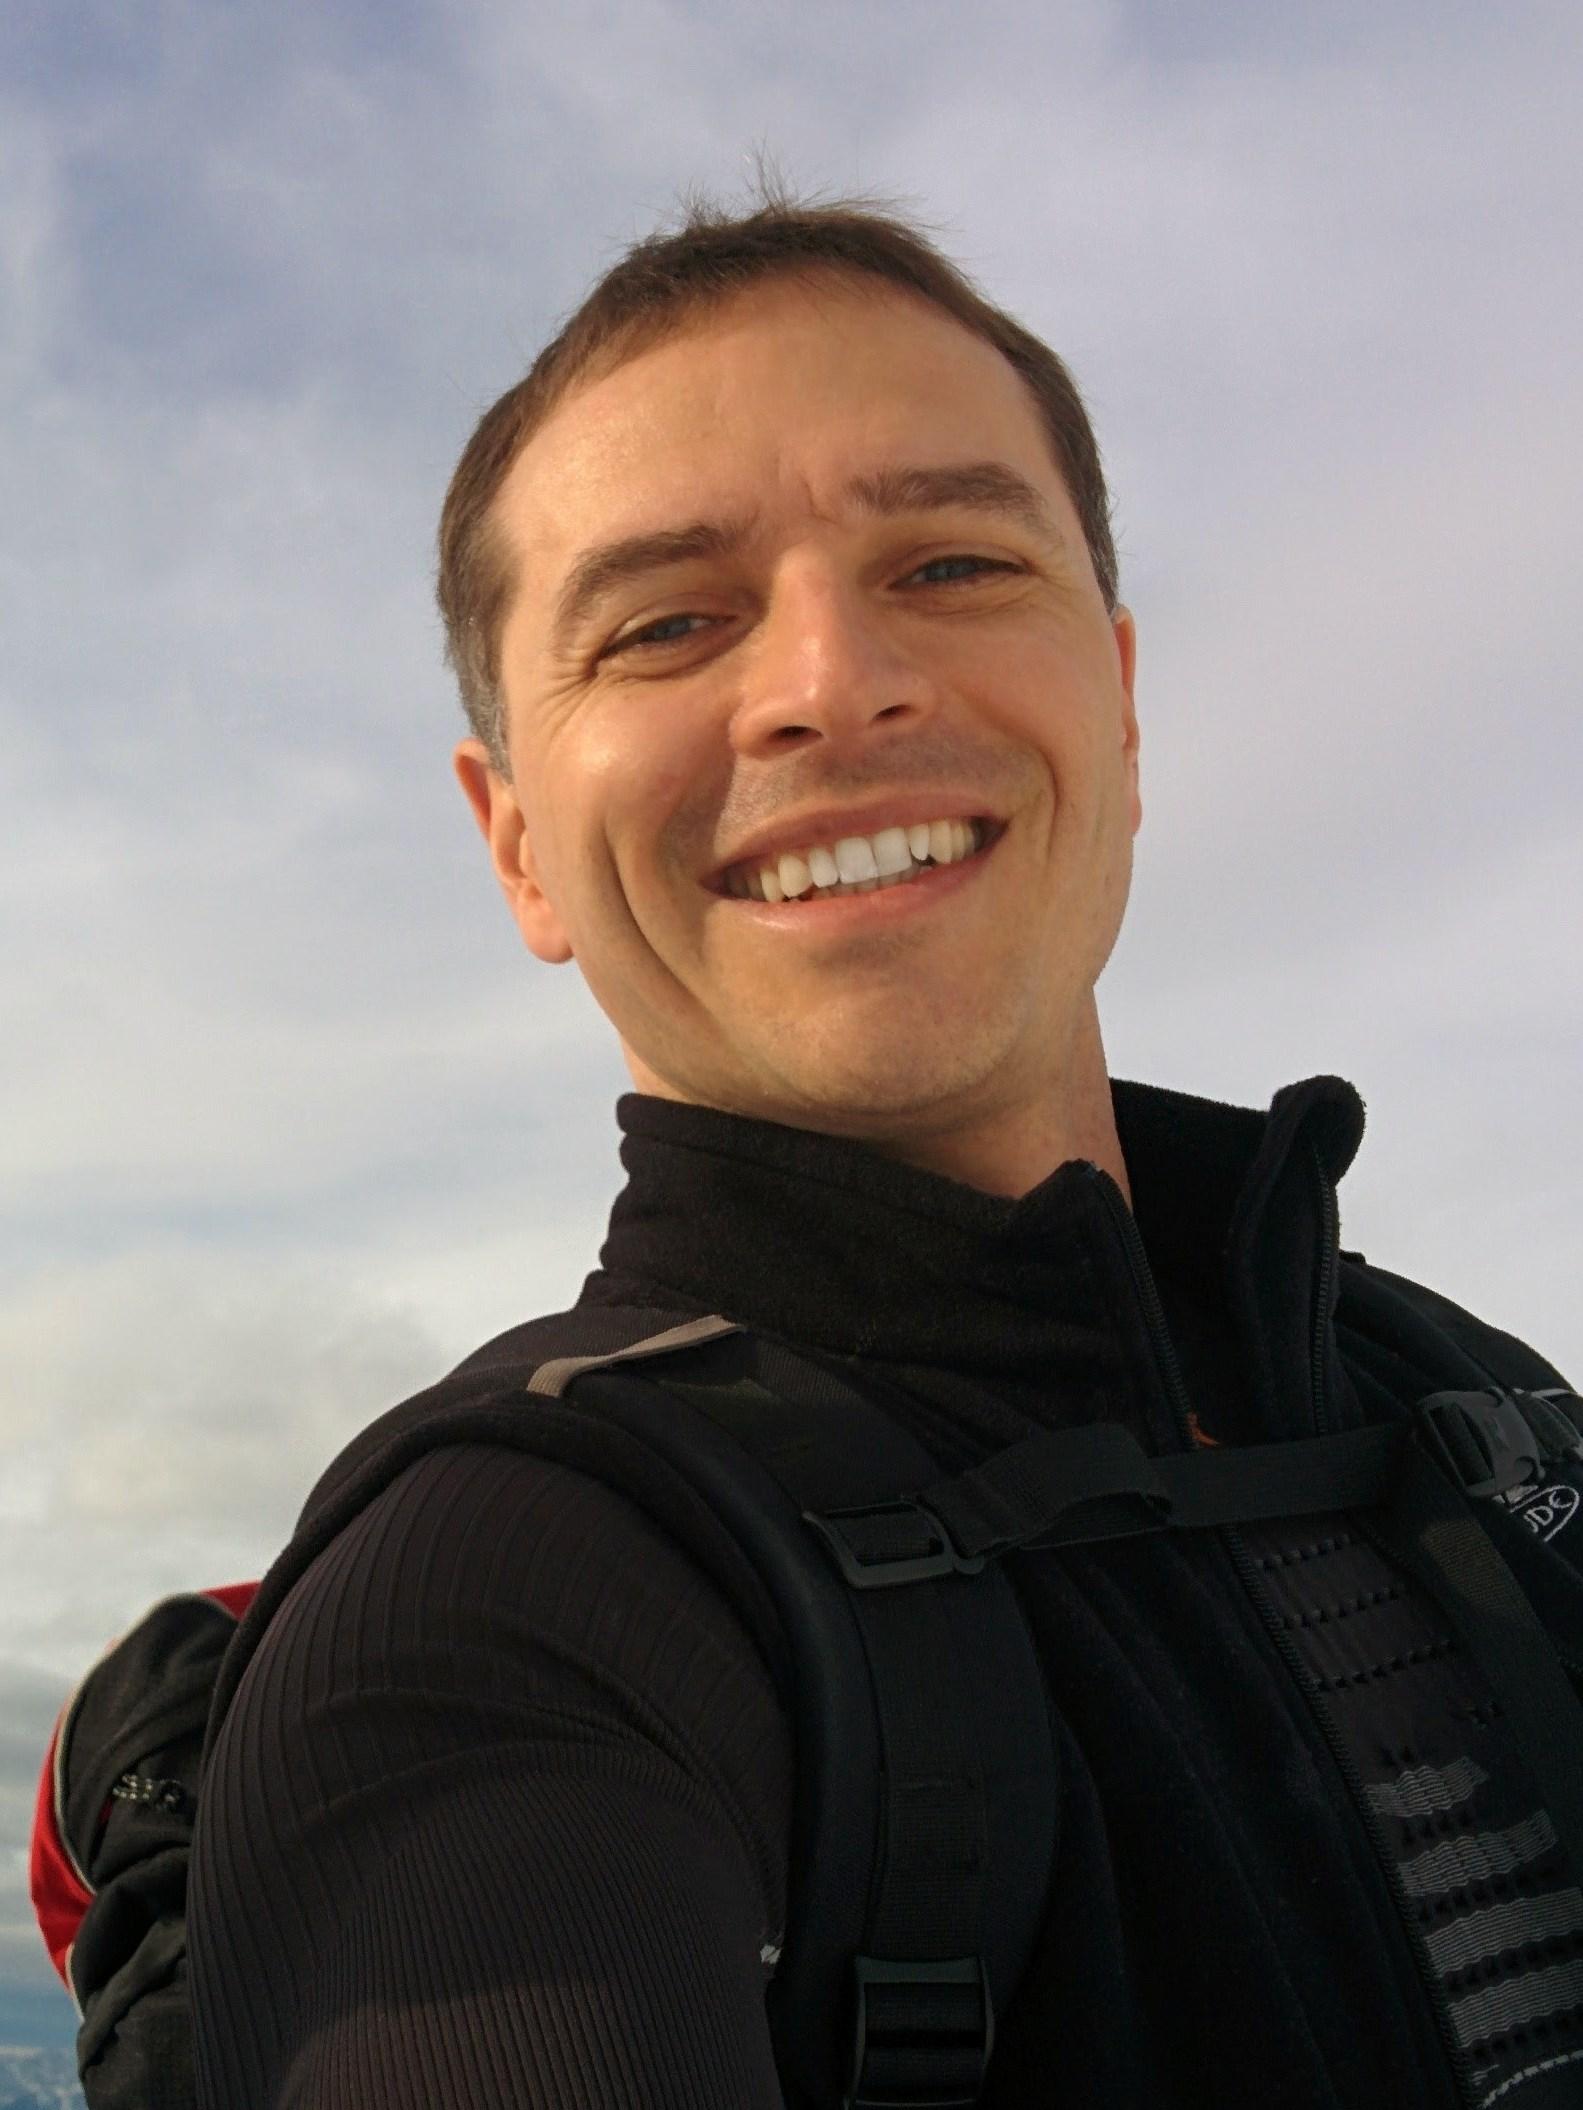 Robert Klar Profilbild